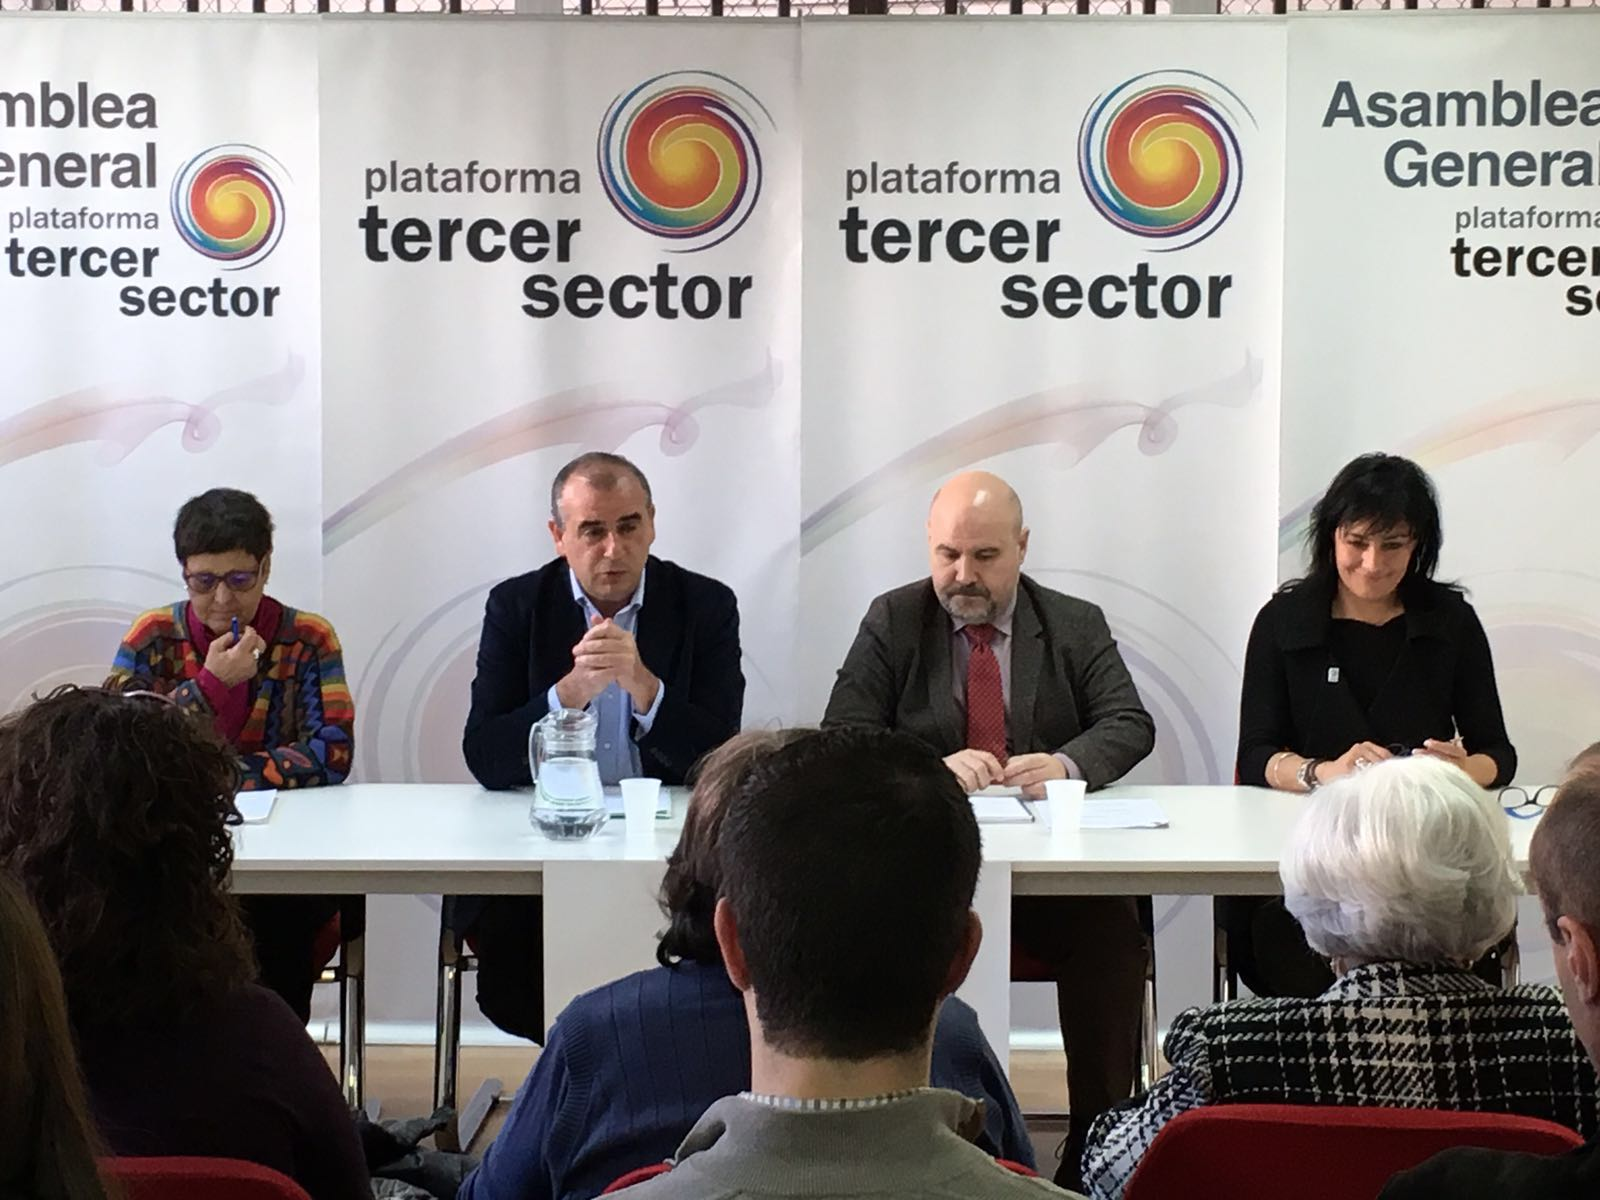 Rueda de Prensa de la Plataforma del Tercer Sector